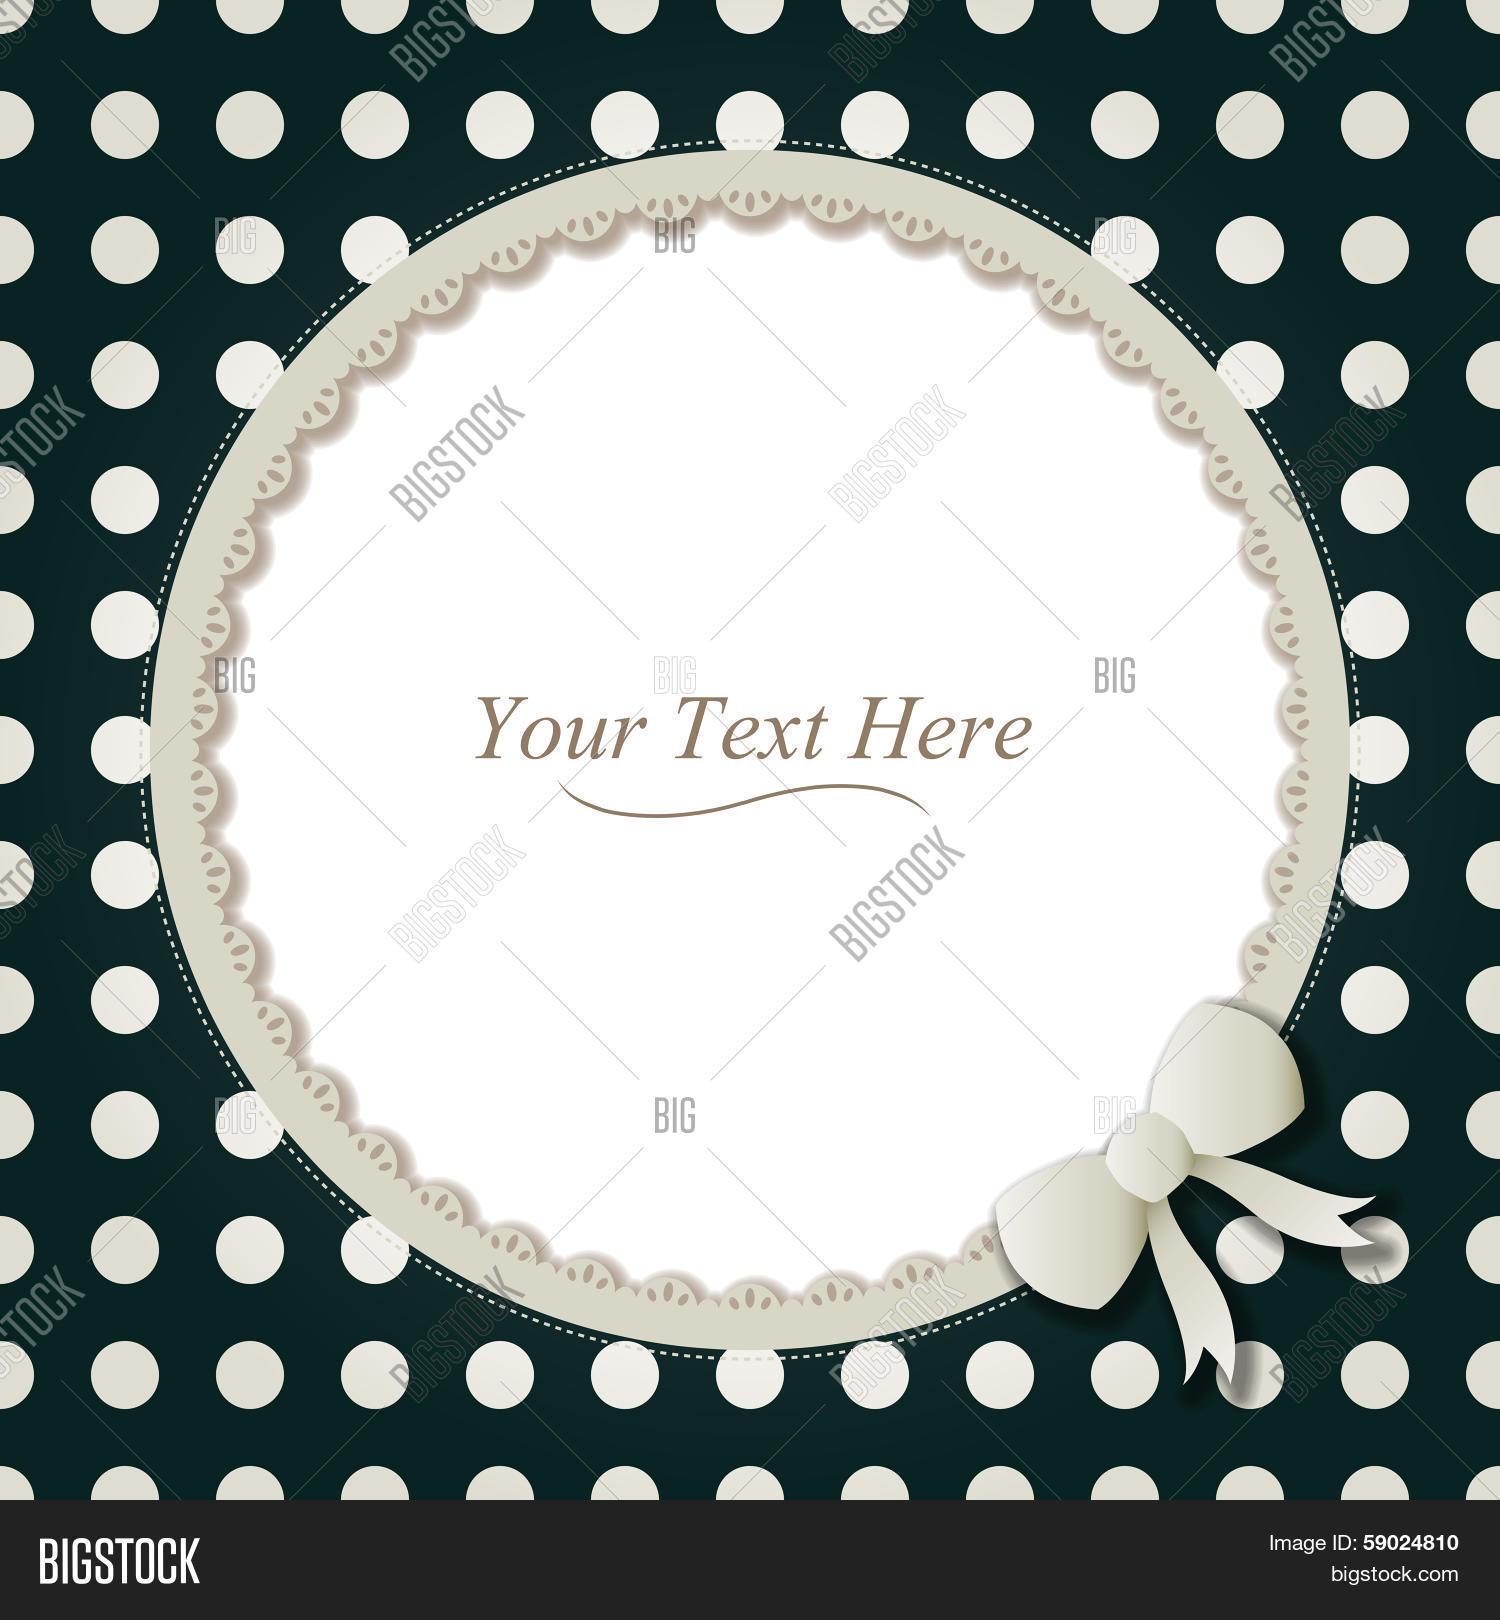 Round Polka Dot Frame Vector & Photo (Free Trial) | Bigstock